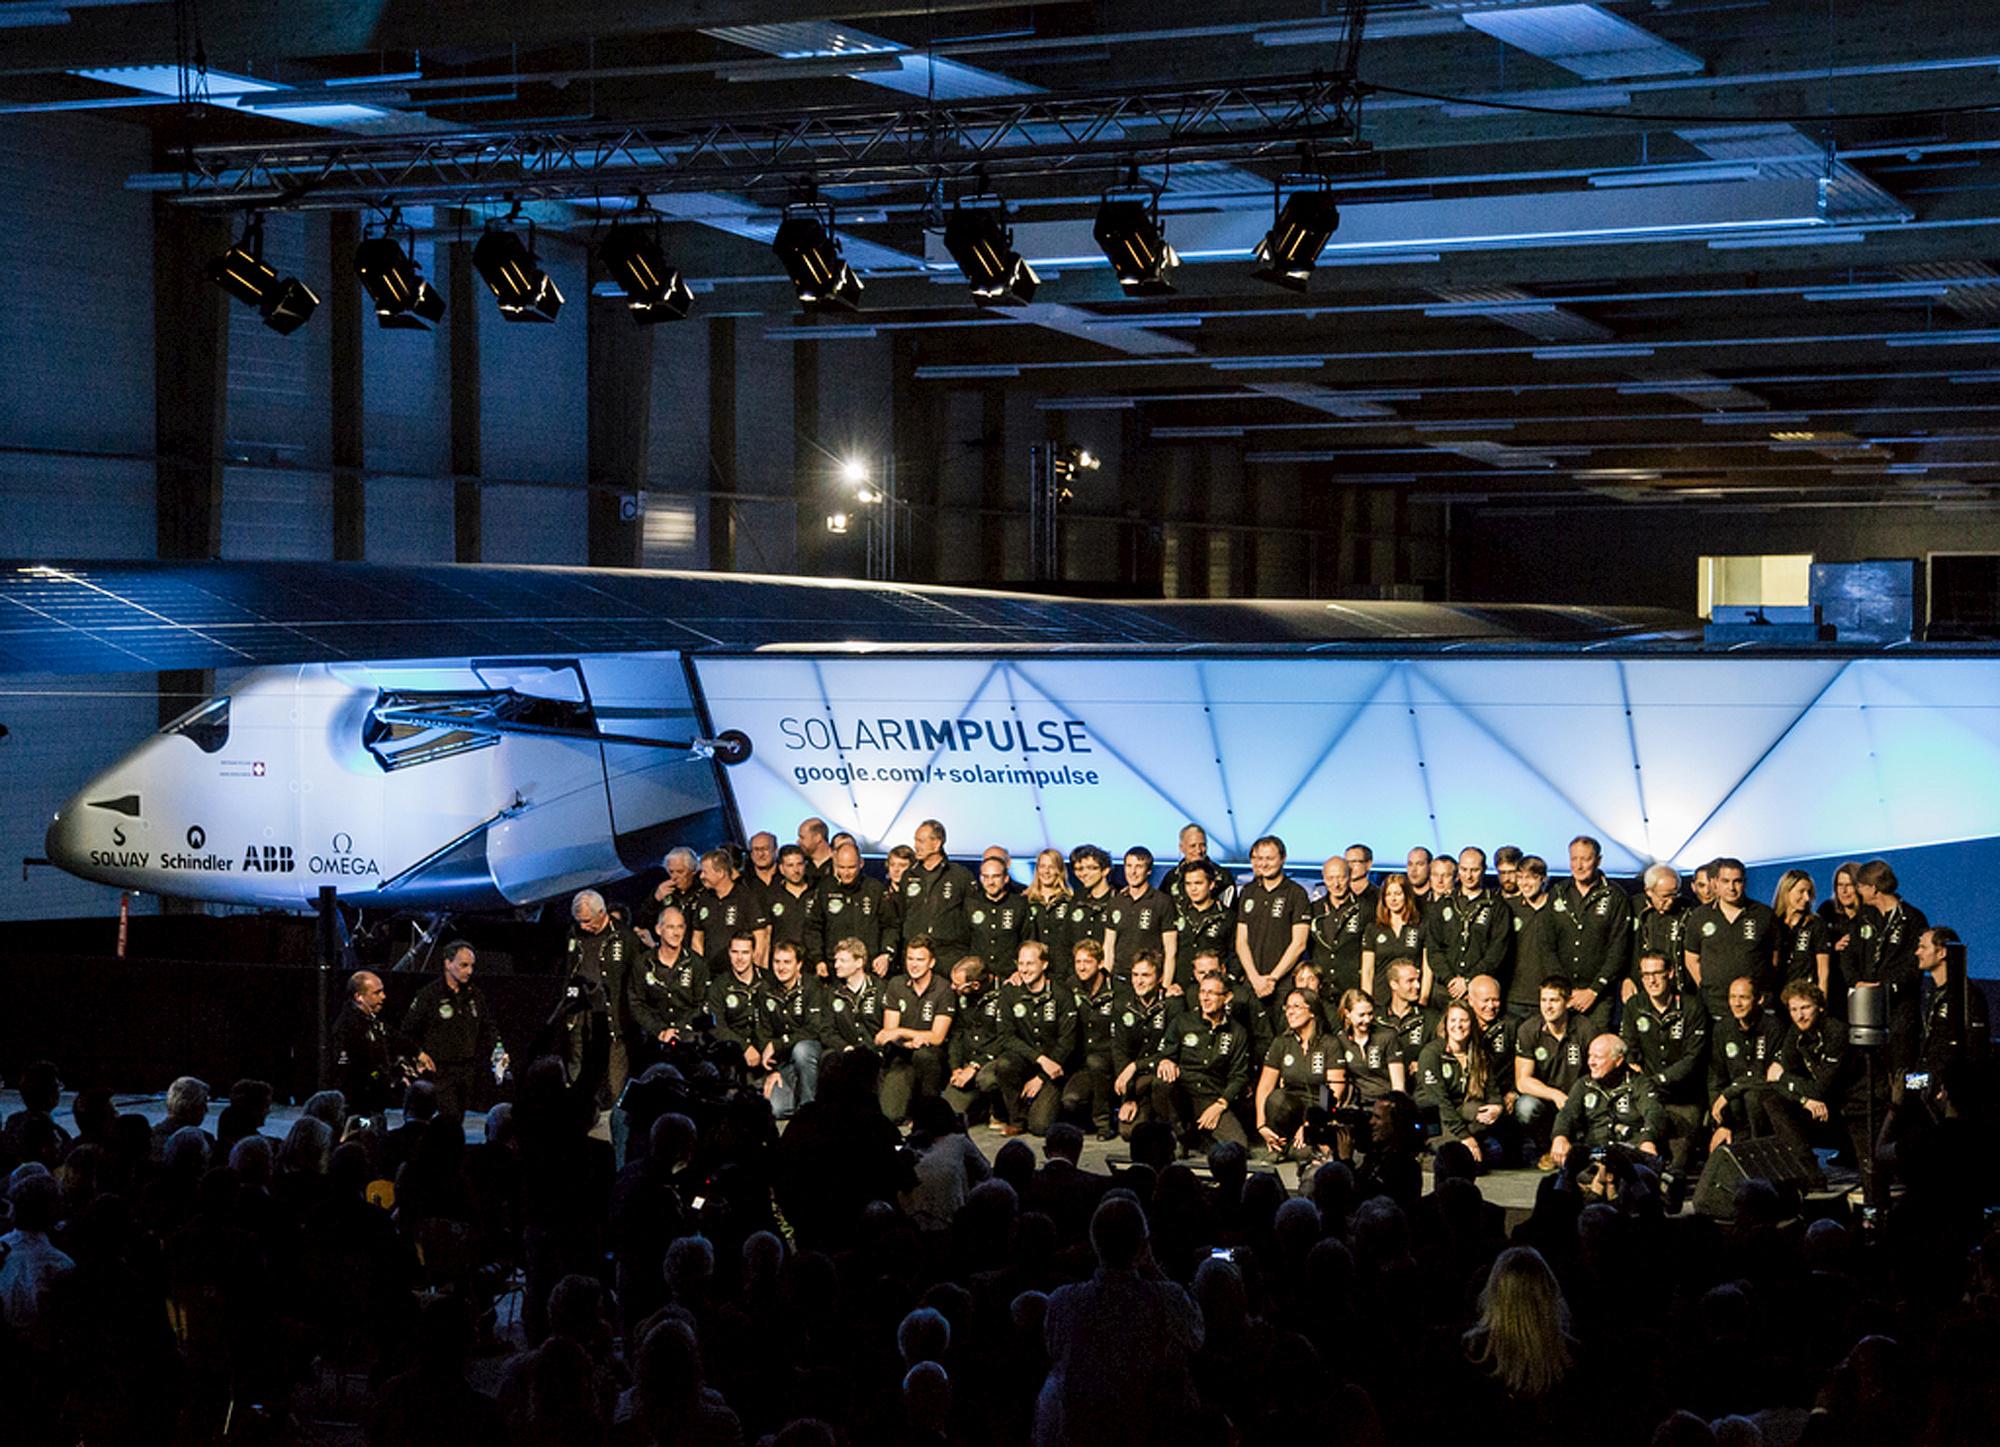 COPYRIGHT: Solar Impulse, Ackermann - rezo.ch